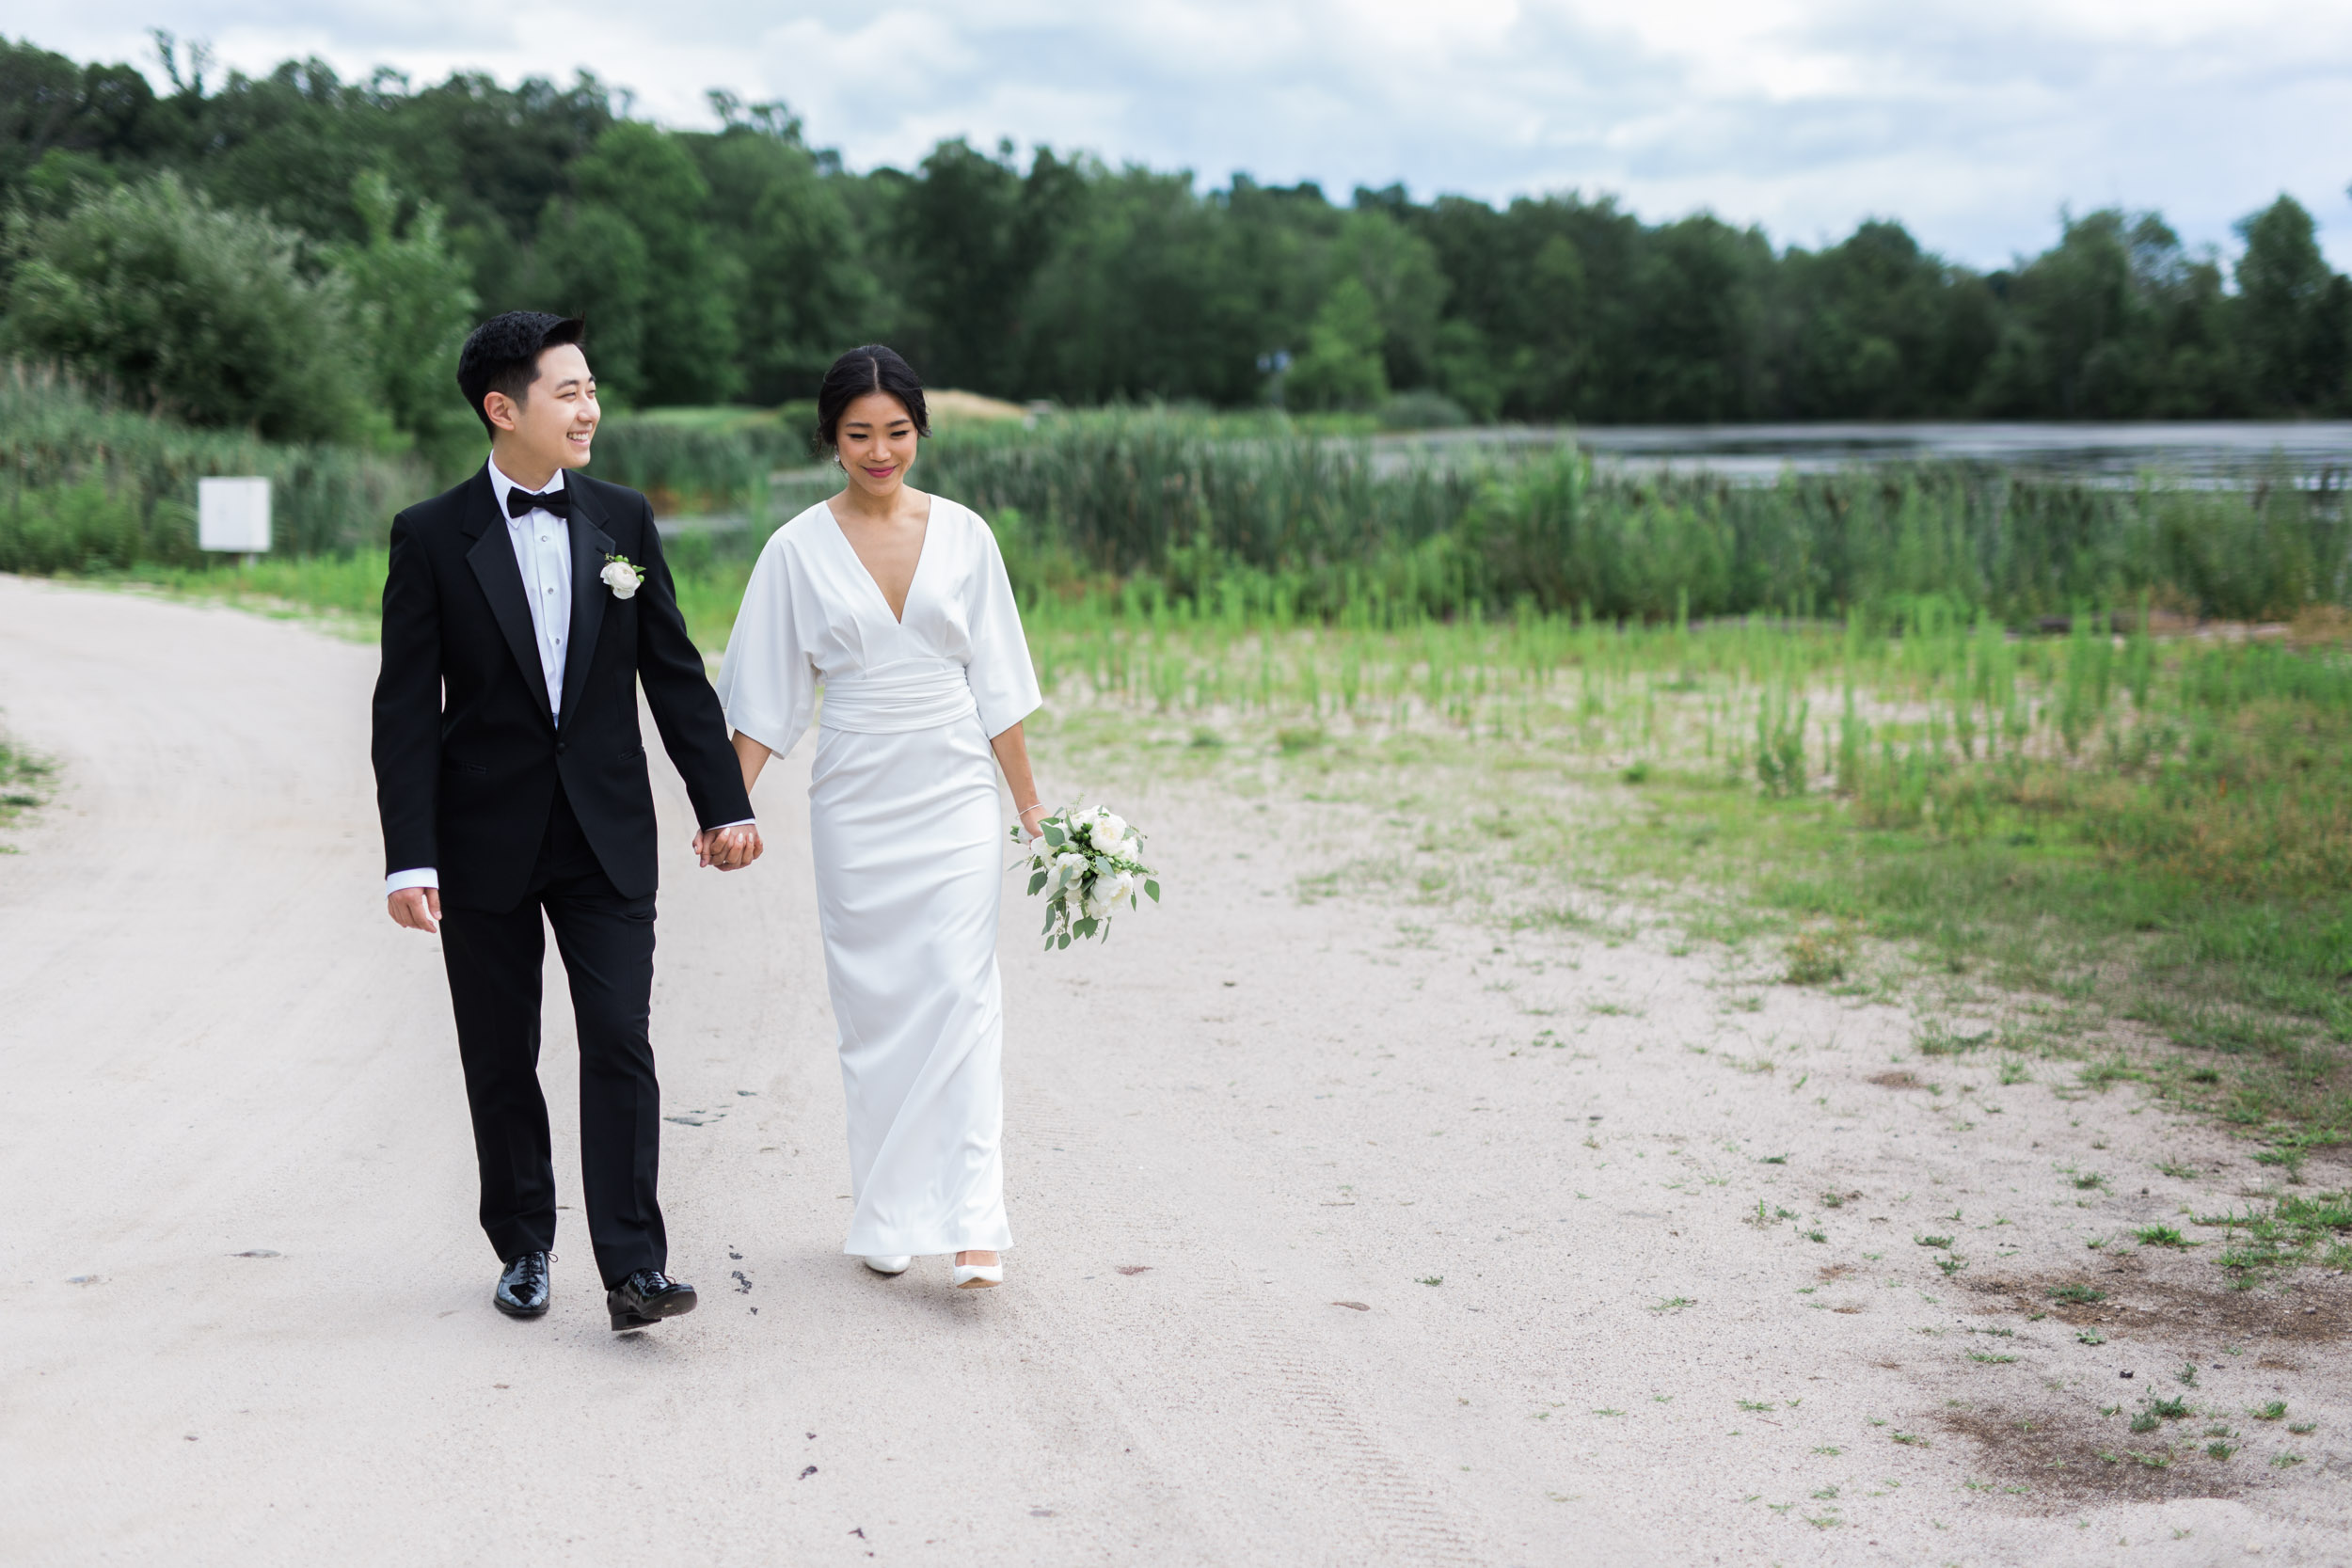 jean-arnold-wedding-0007.jpg